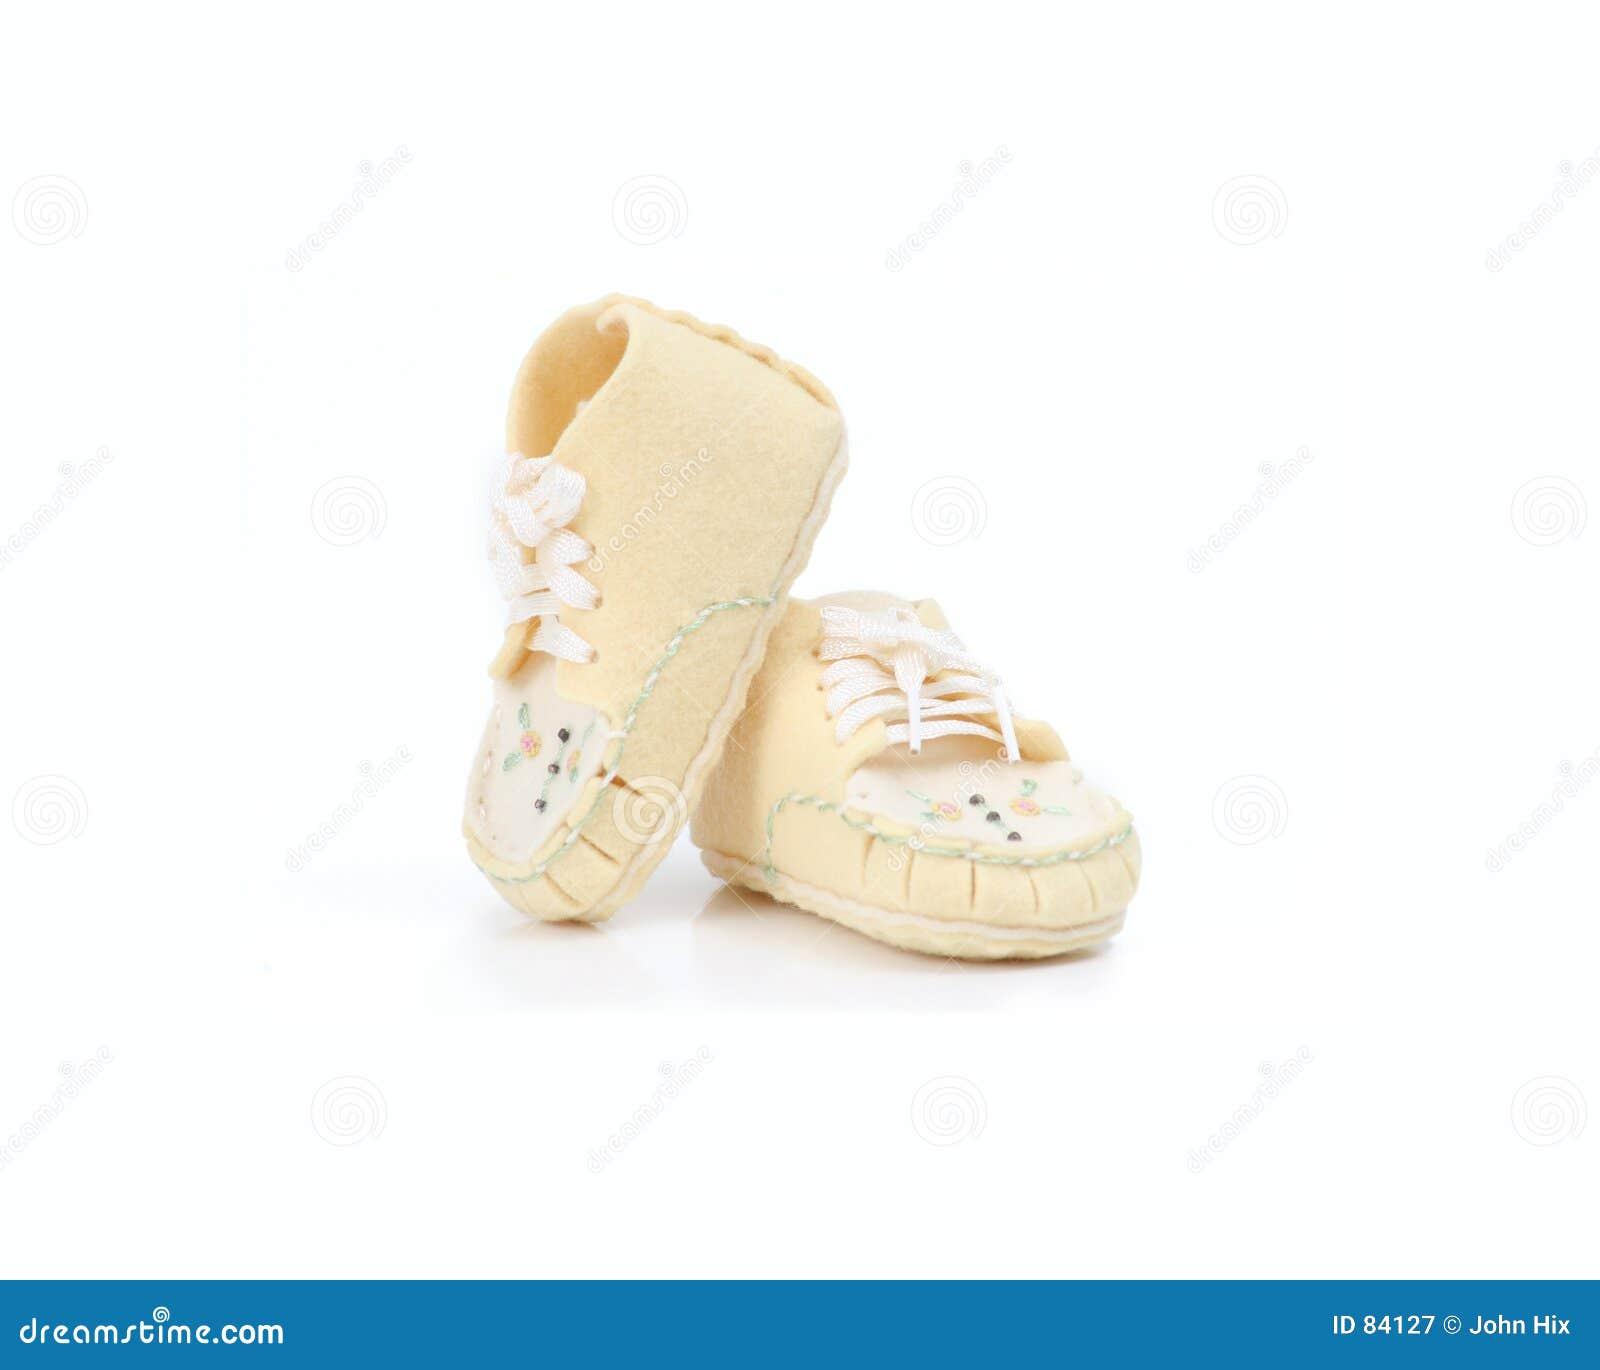 Dziecko iii buty